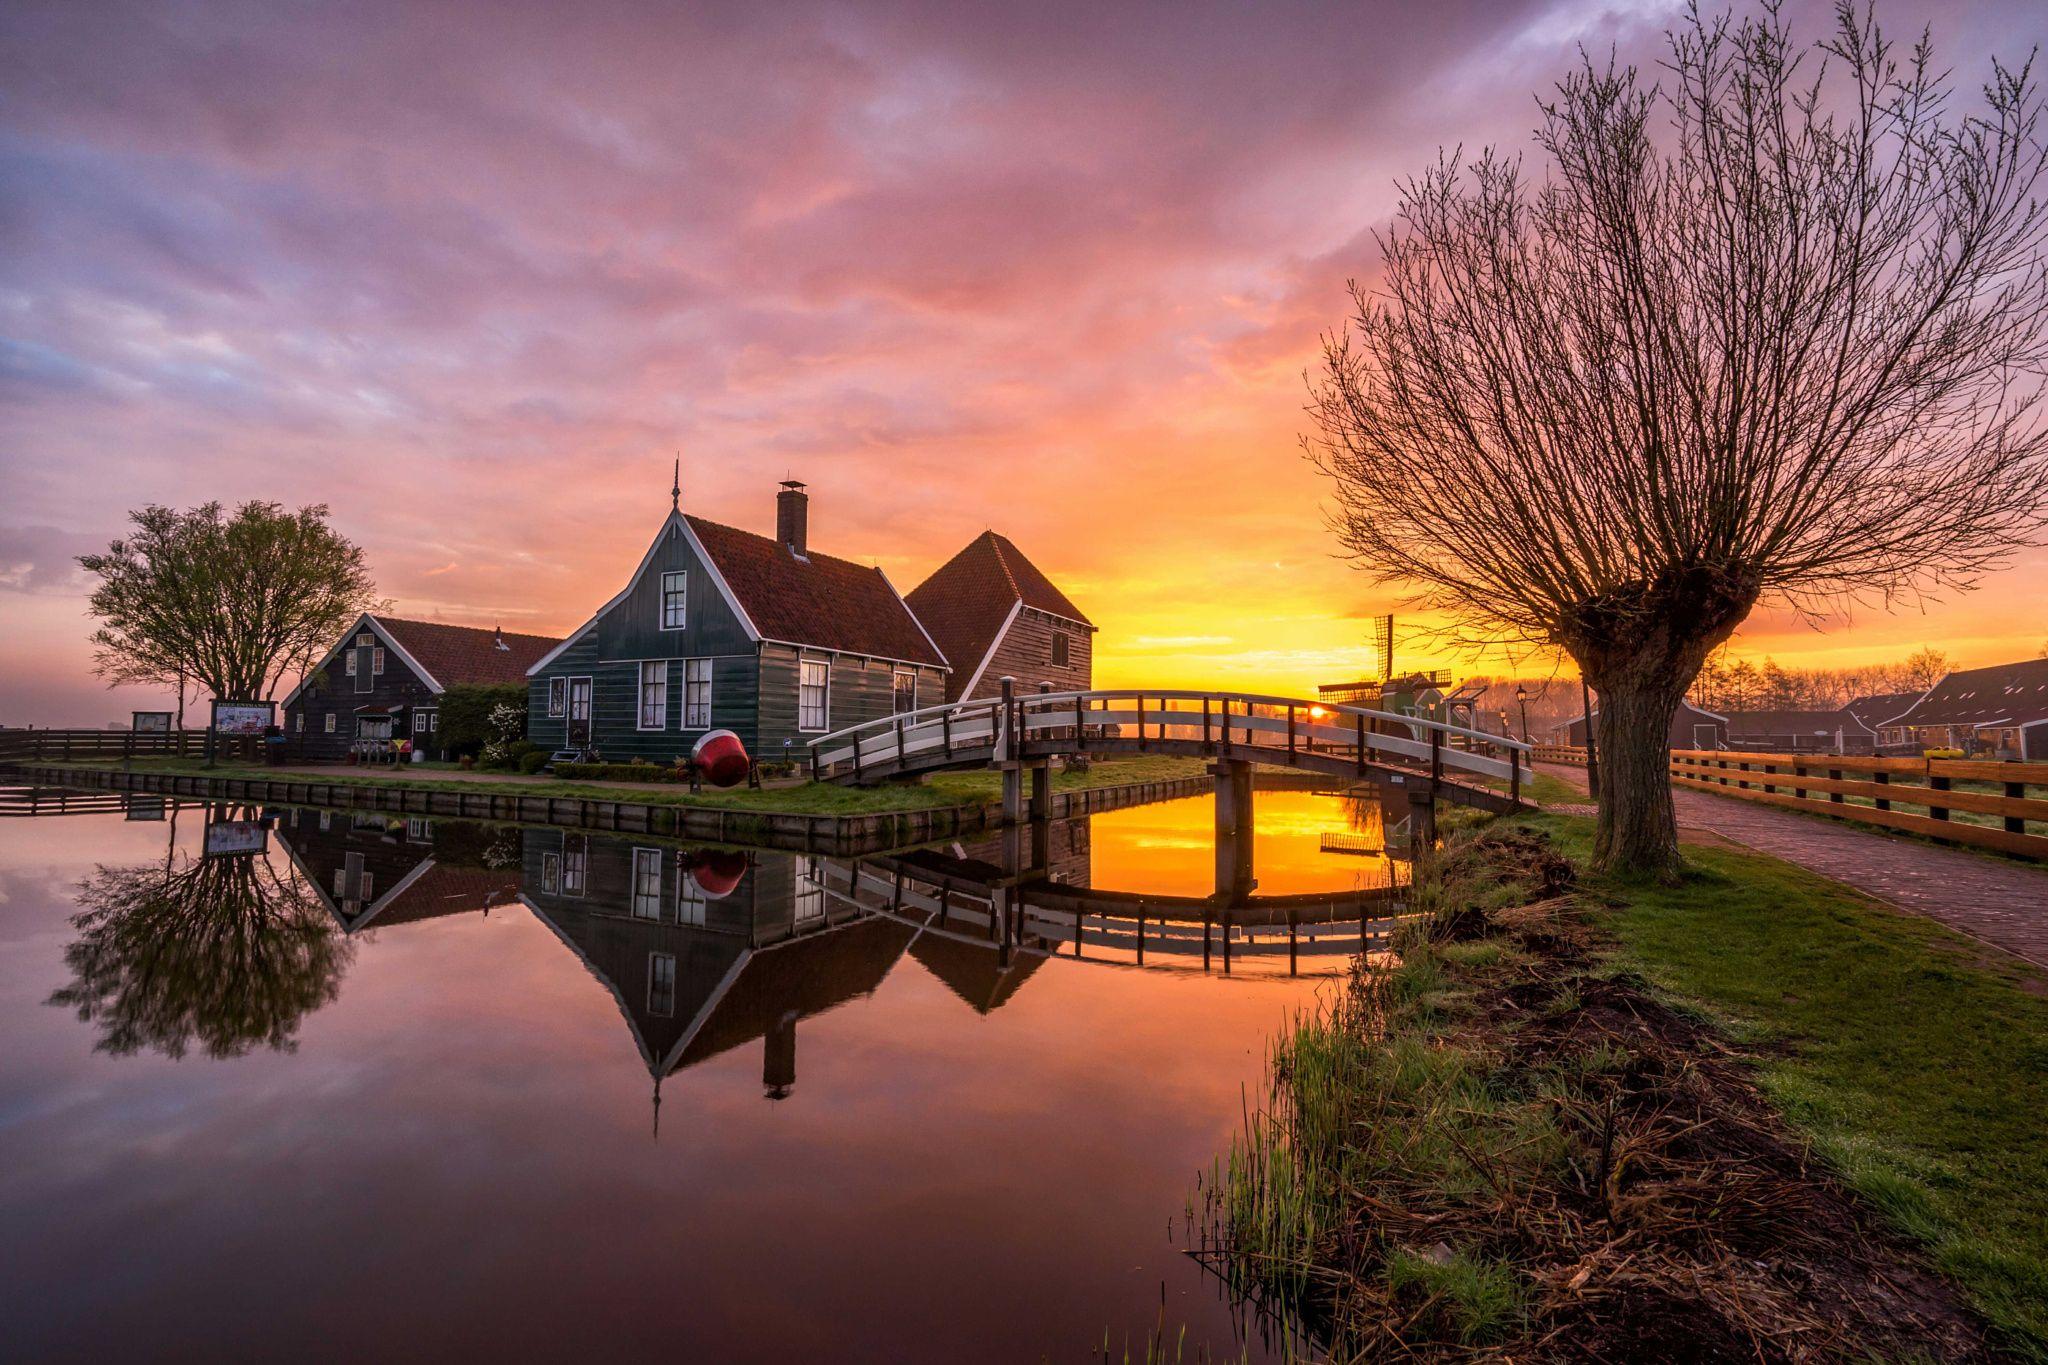 Sunrise at the Schans -